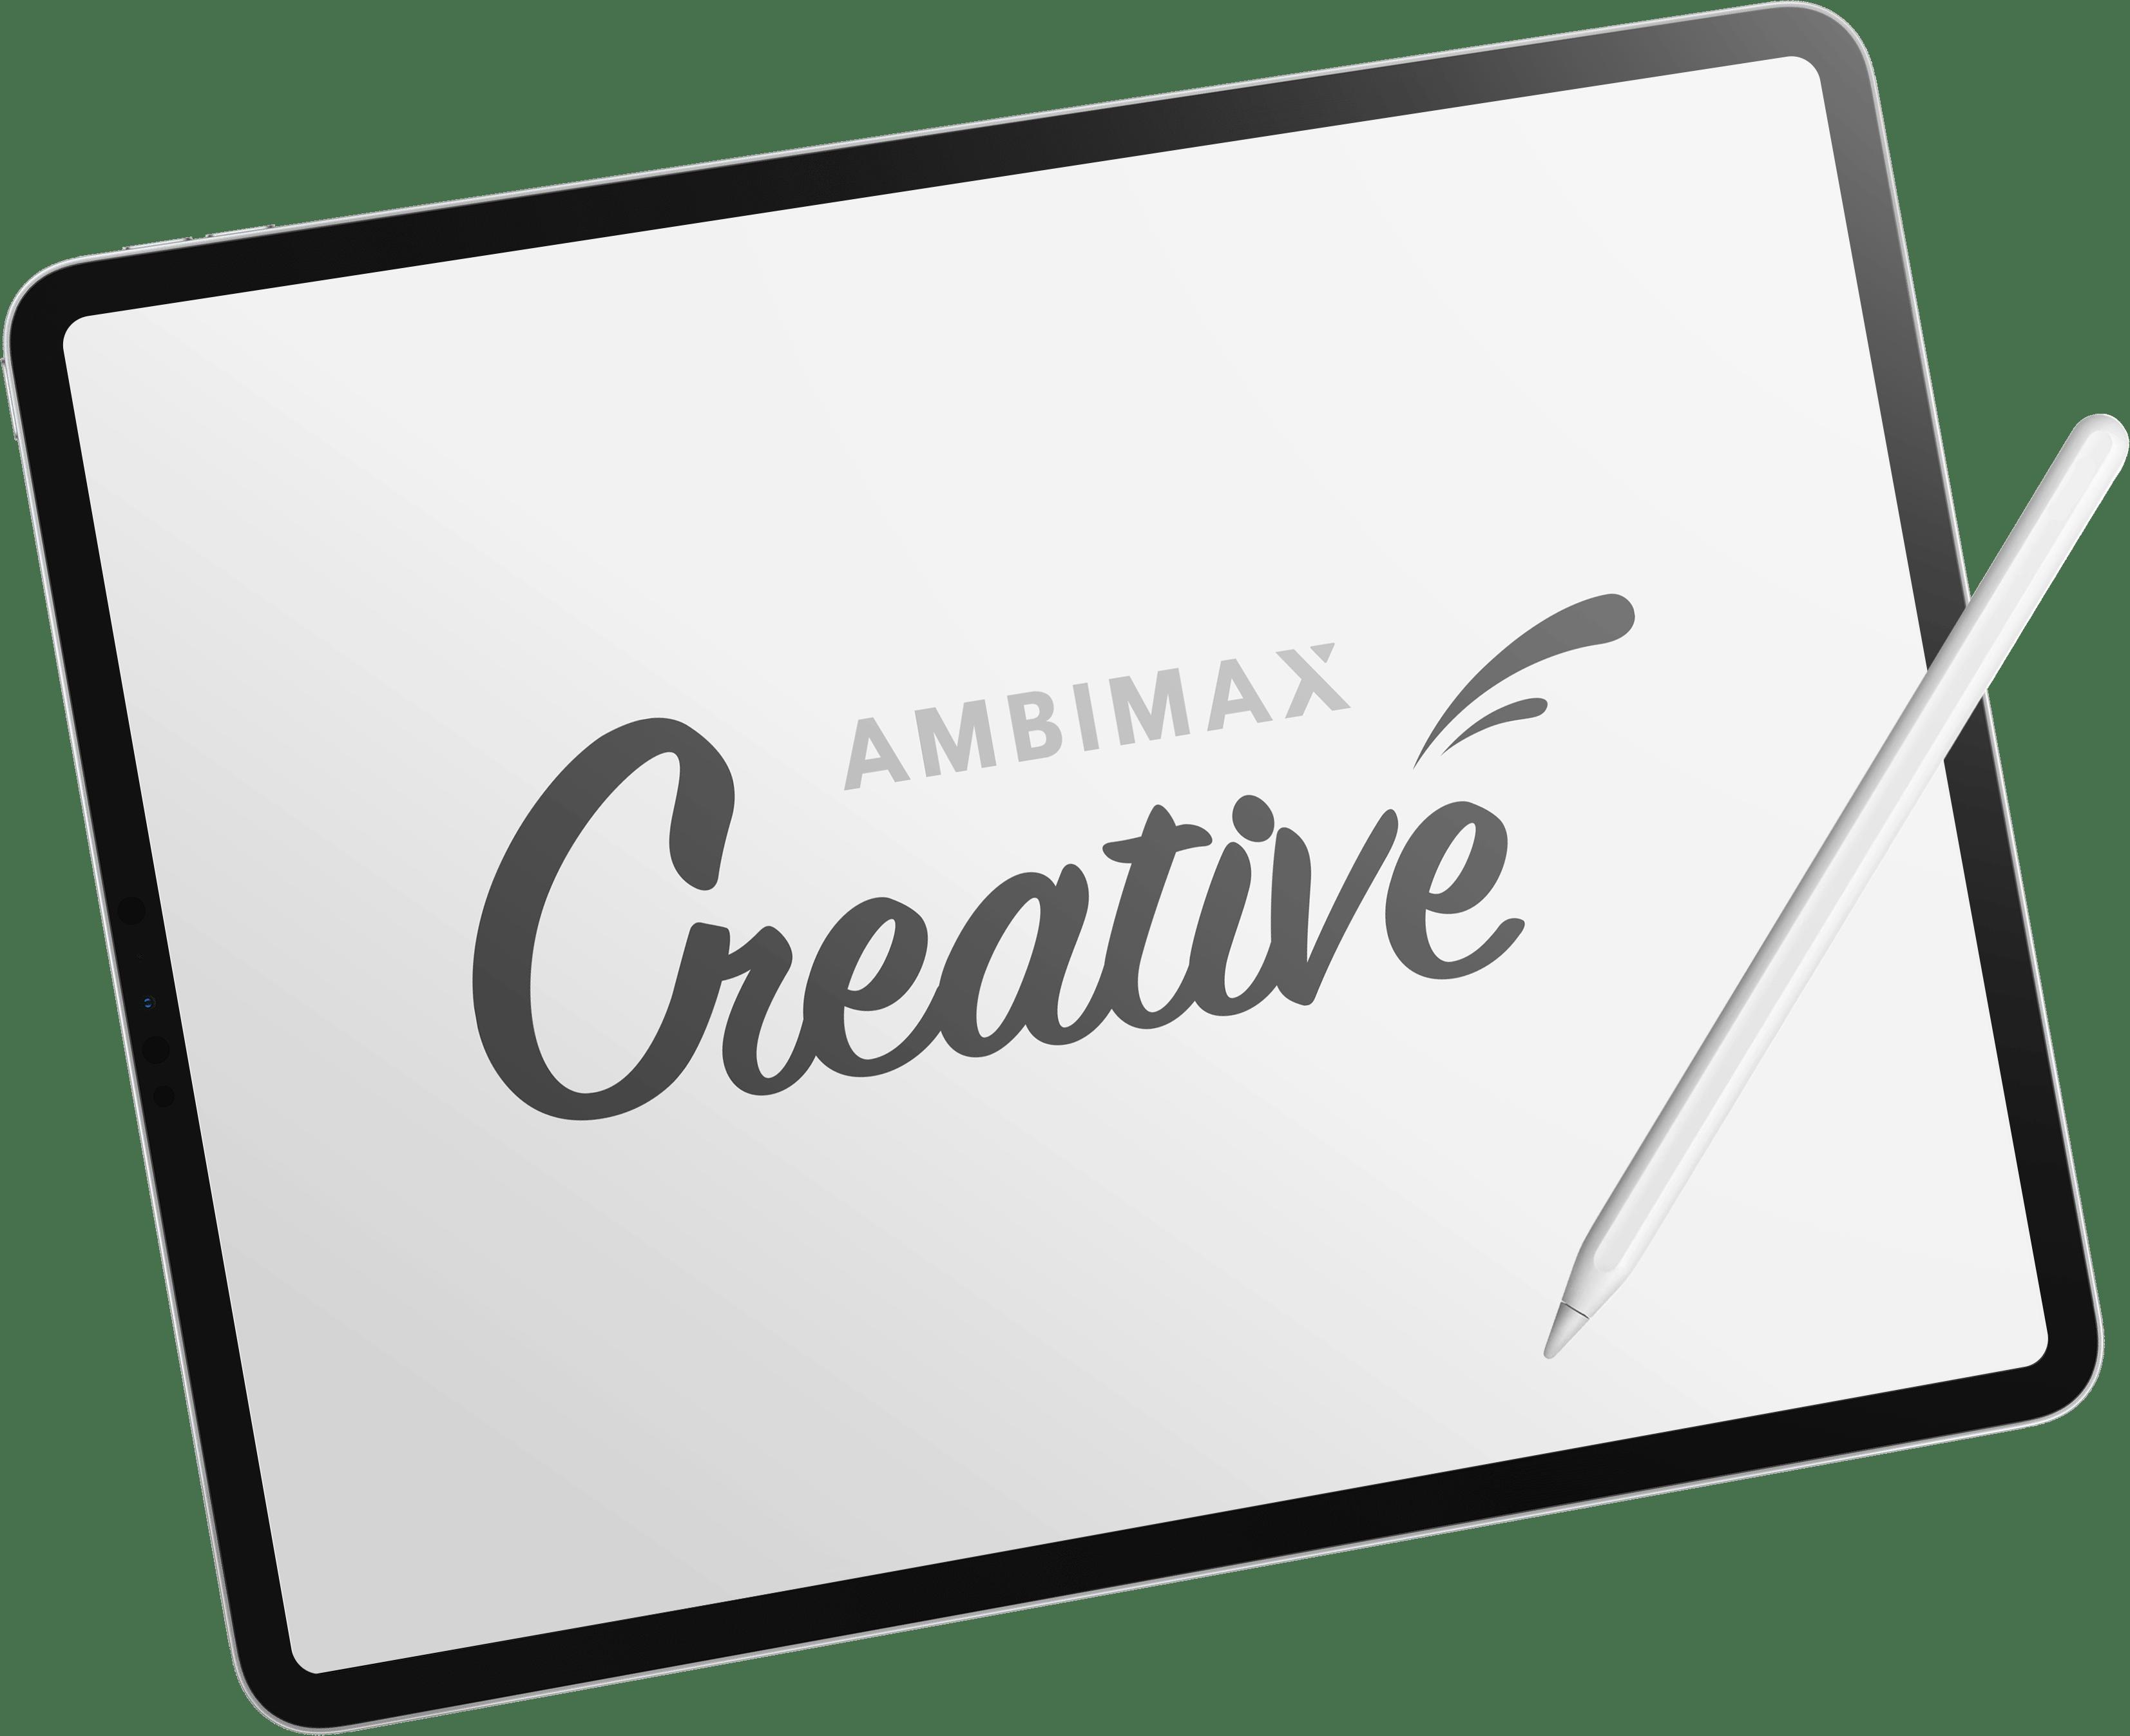 Ambimax Creative Logo Tablet Design